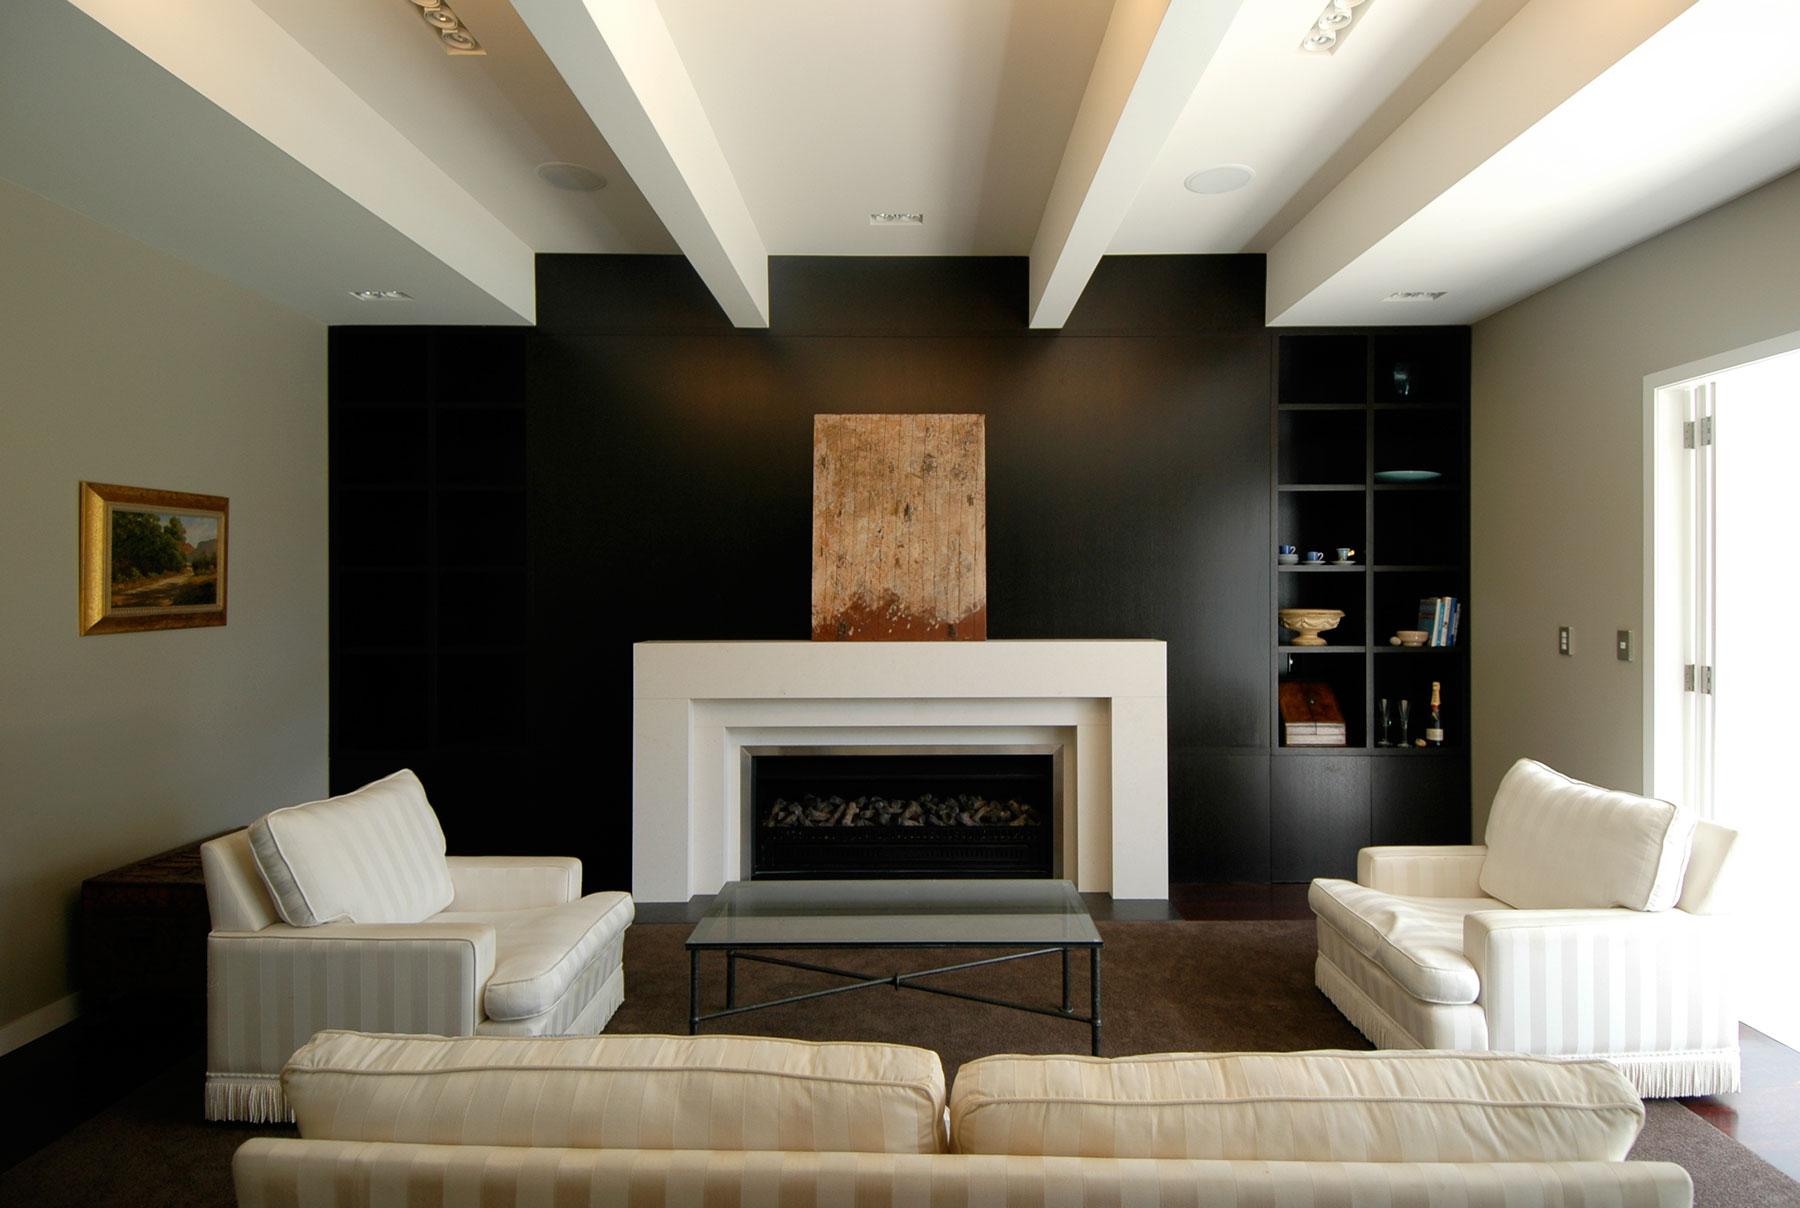 D-Leuschke-Kahn-Architects-080101dadshouse---21.jpg